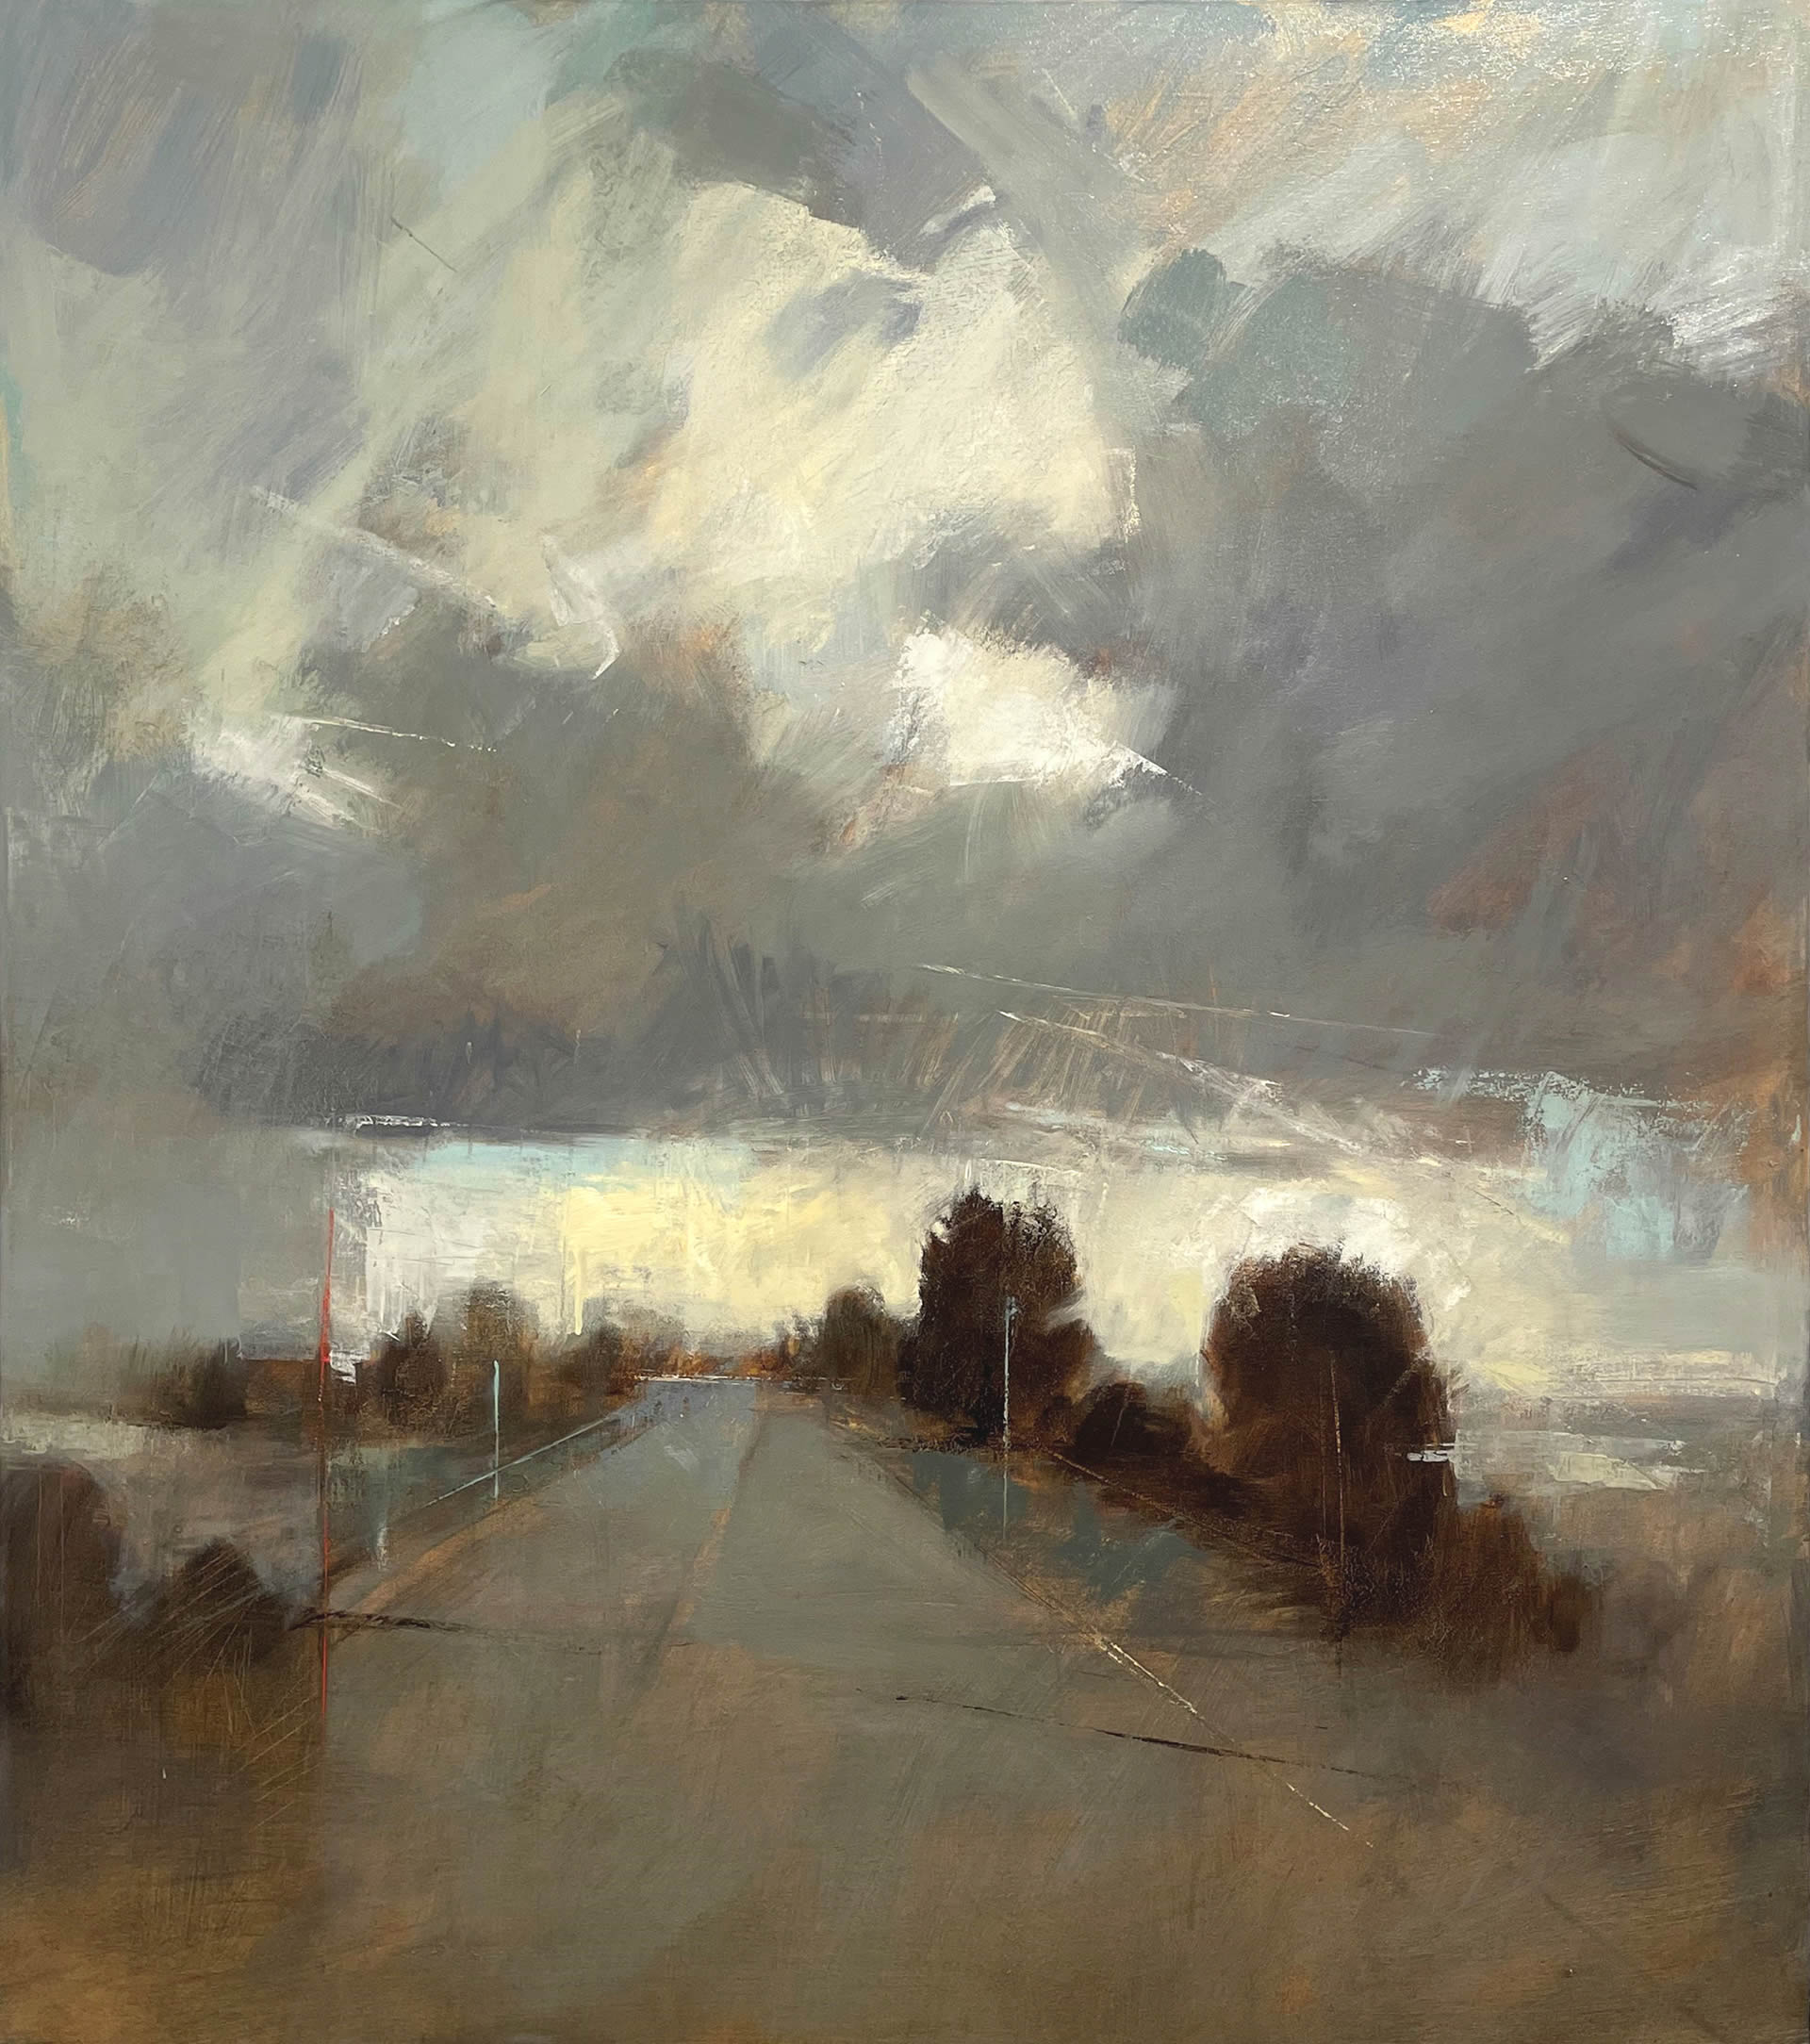 David-Edwards-Within-2014-Oil-On-Canvas-40x36-4100-Online-Art-Galleries